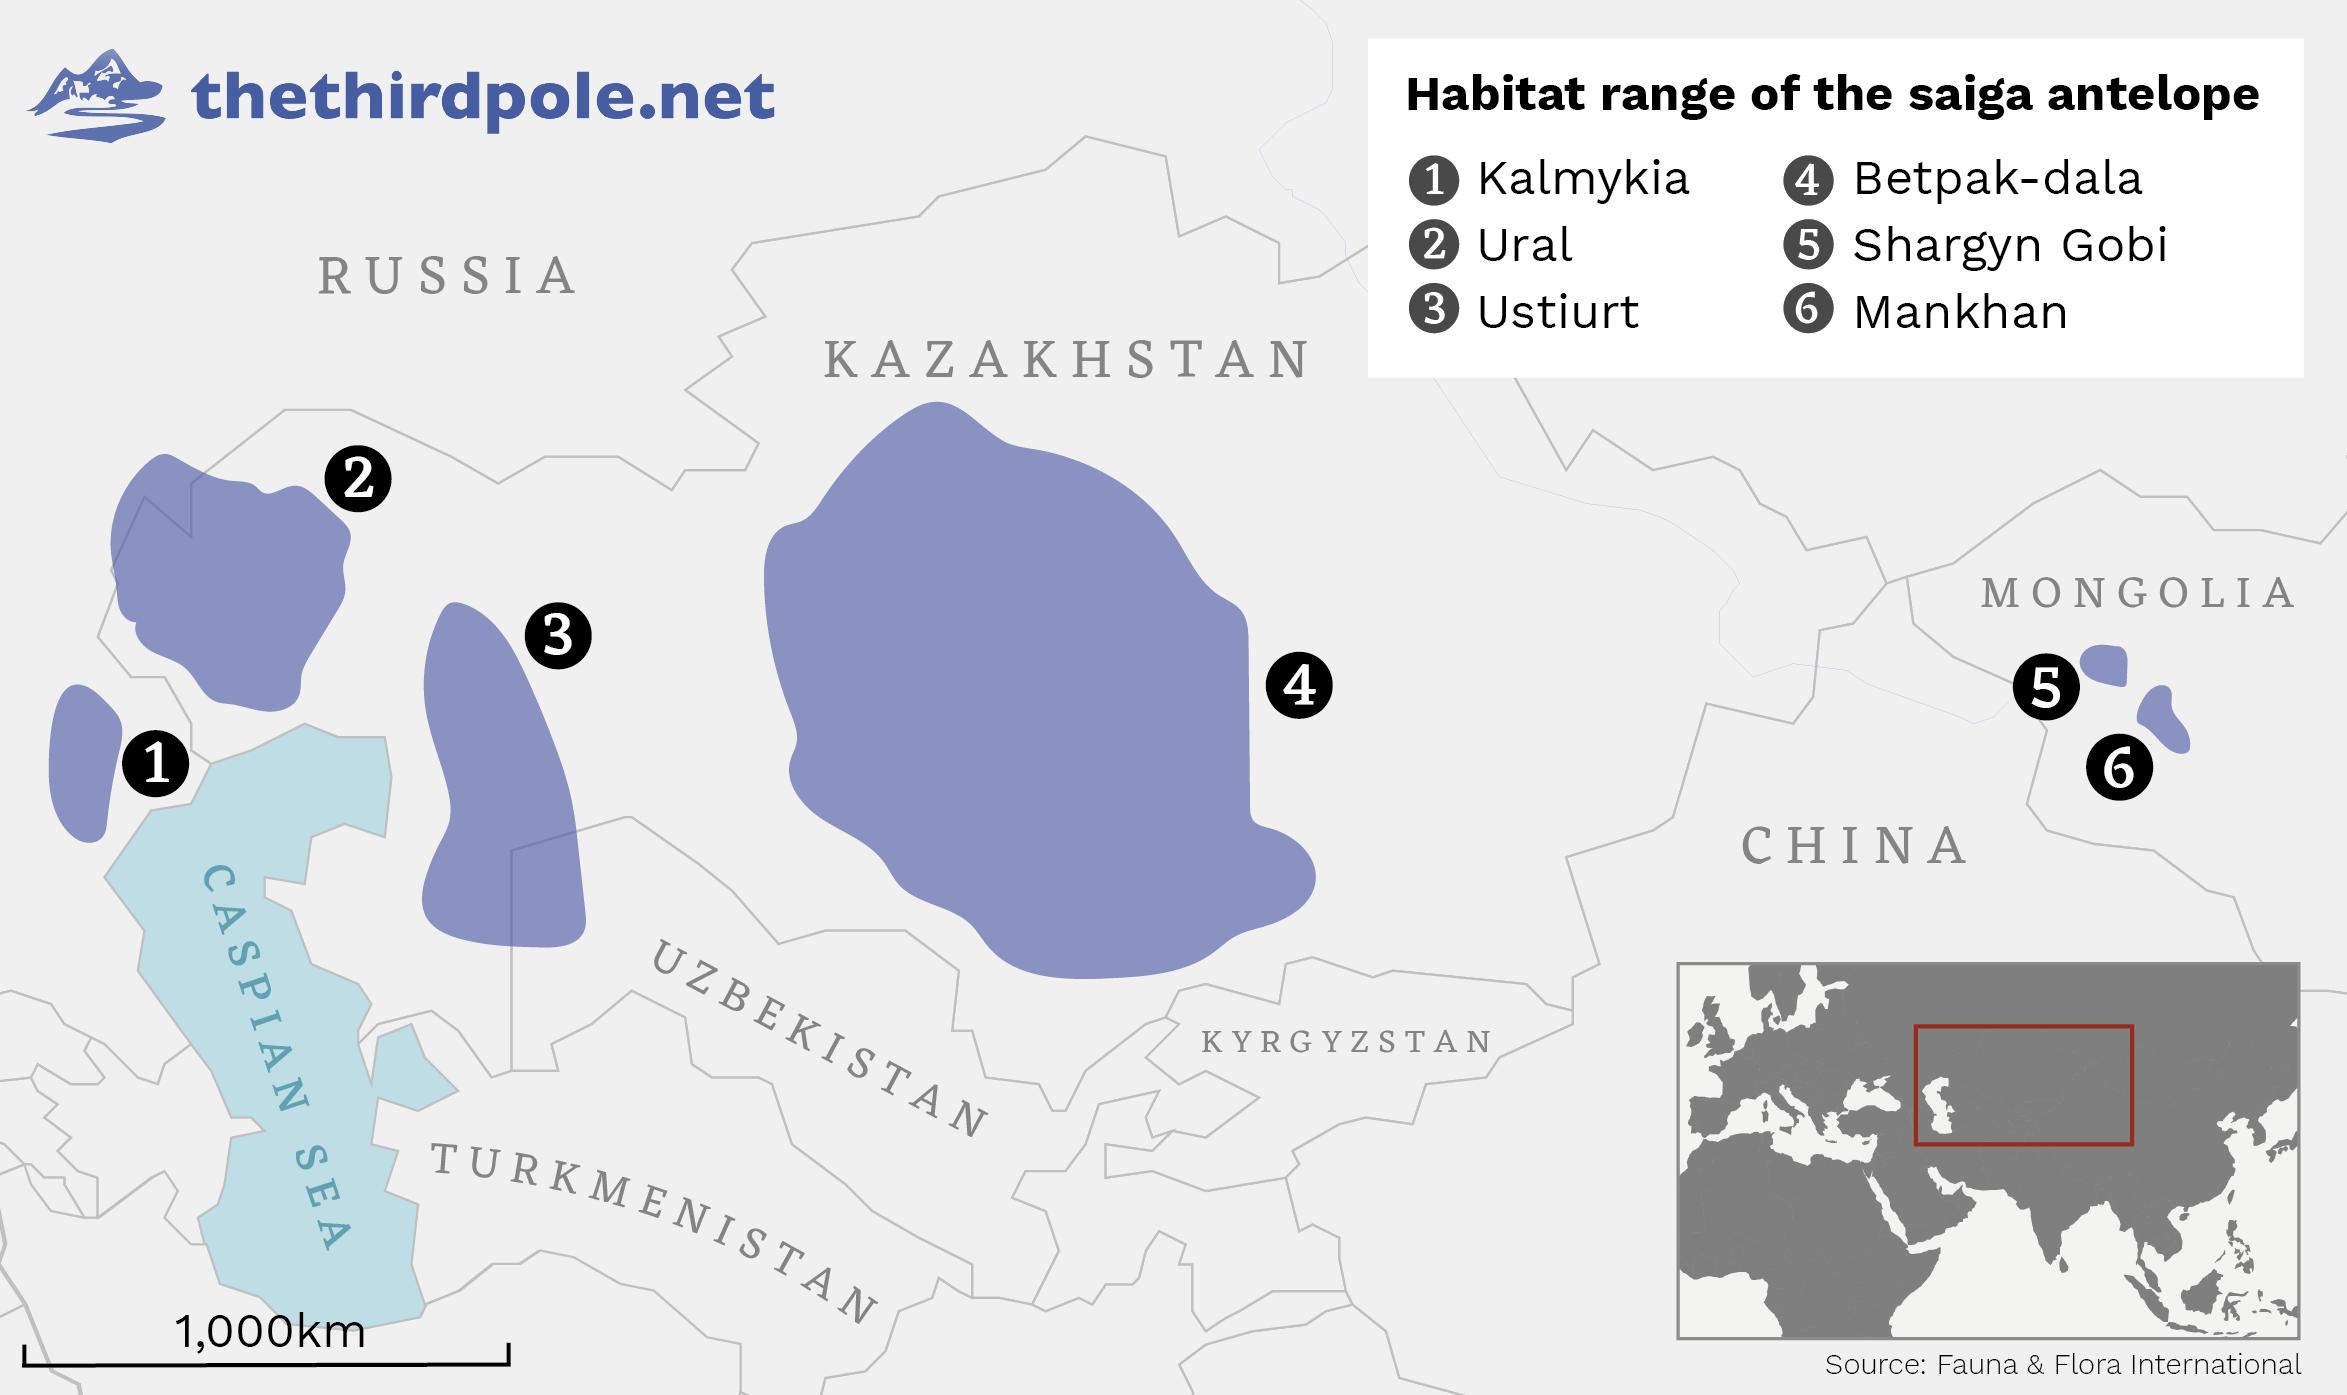 Habitat range of the saiga antelope